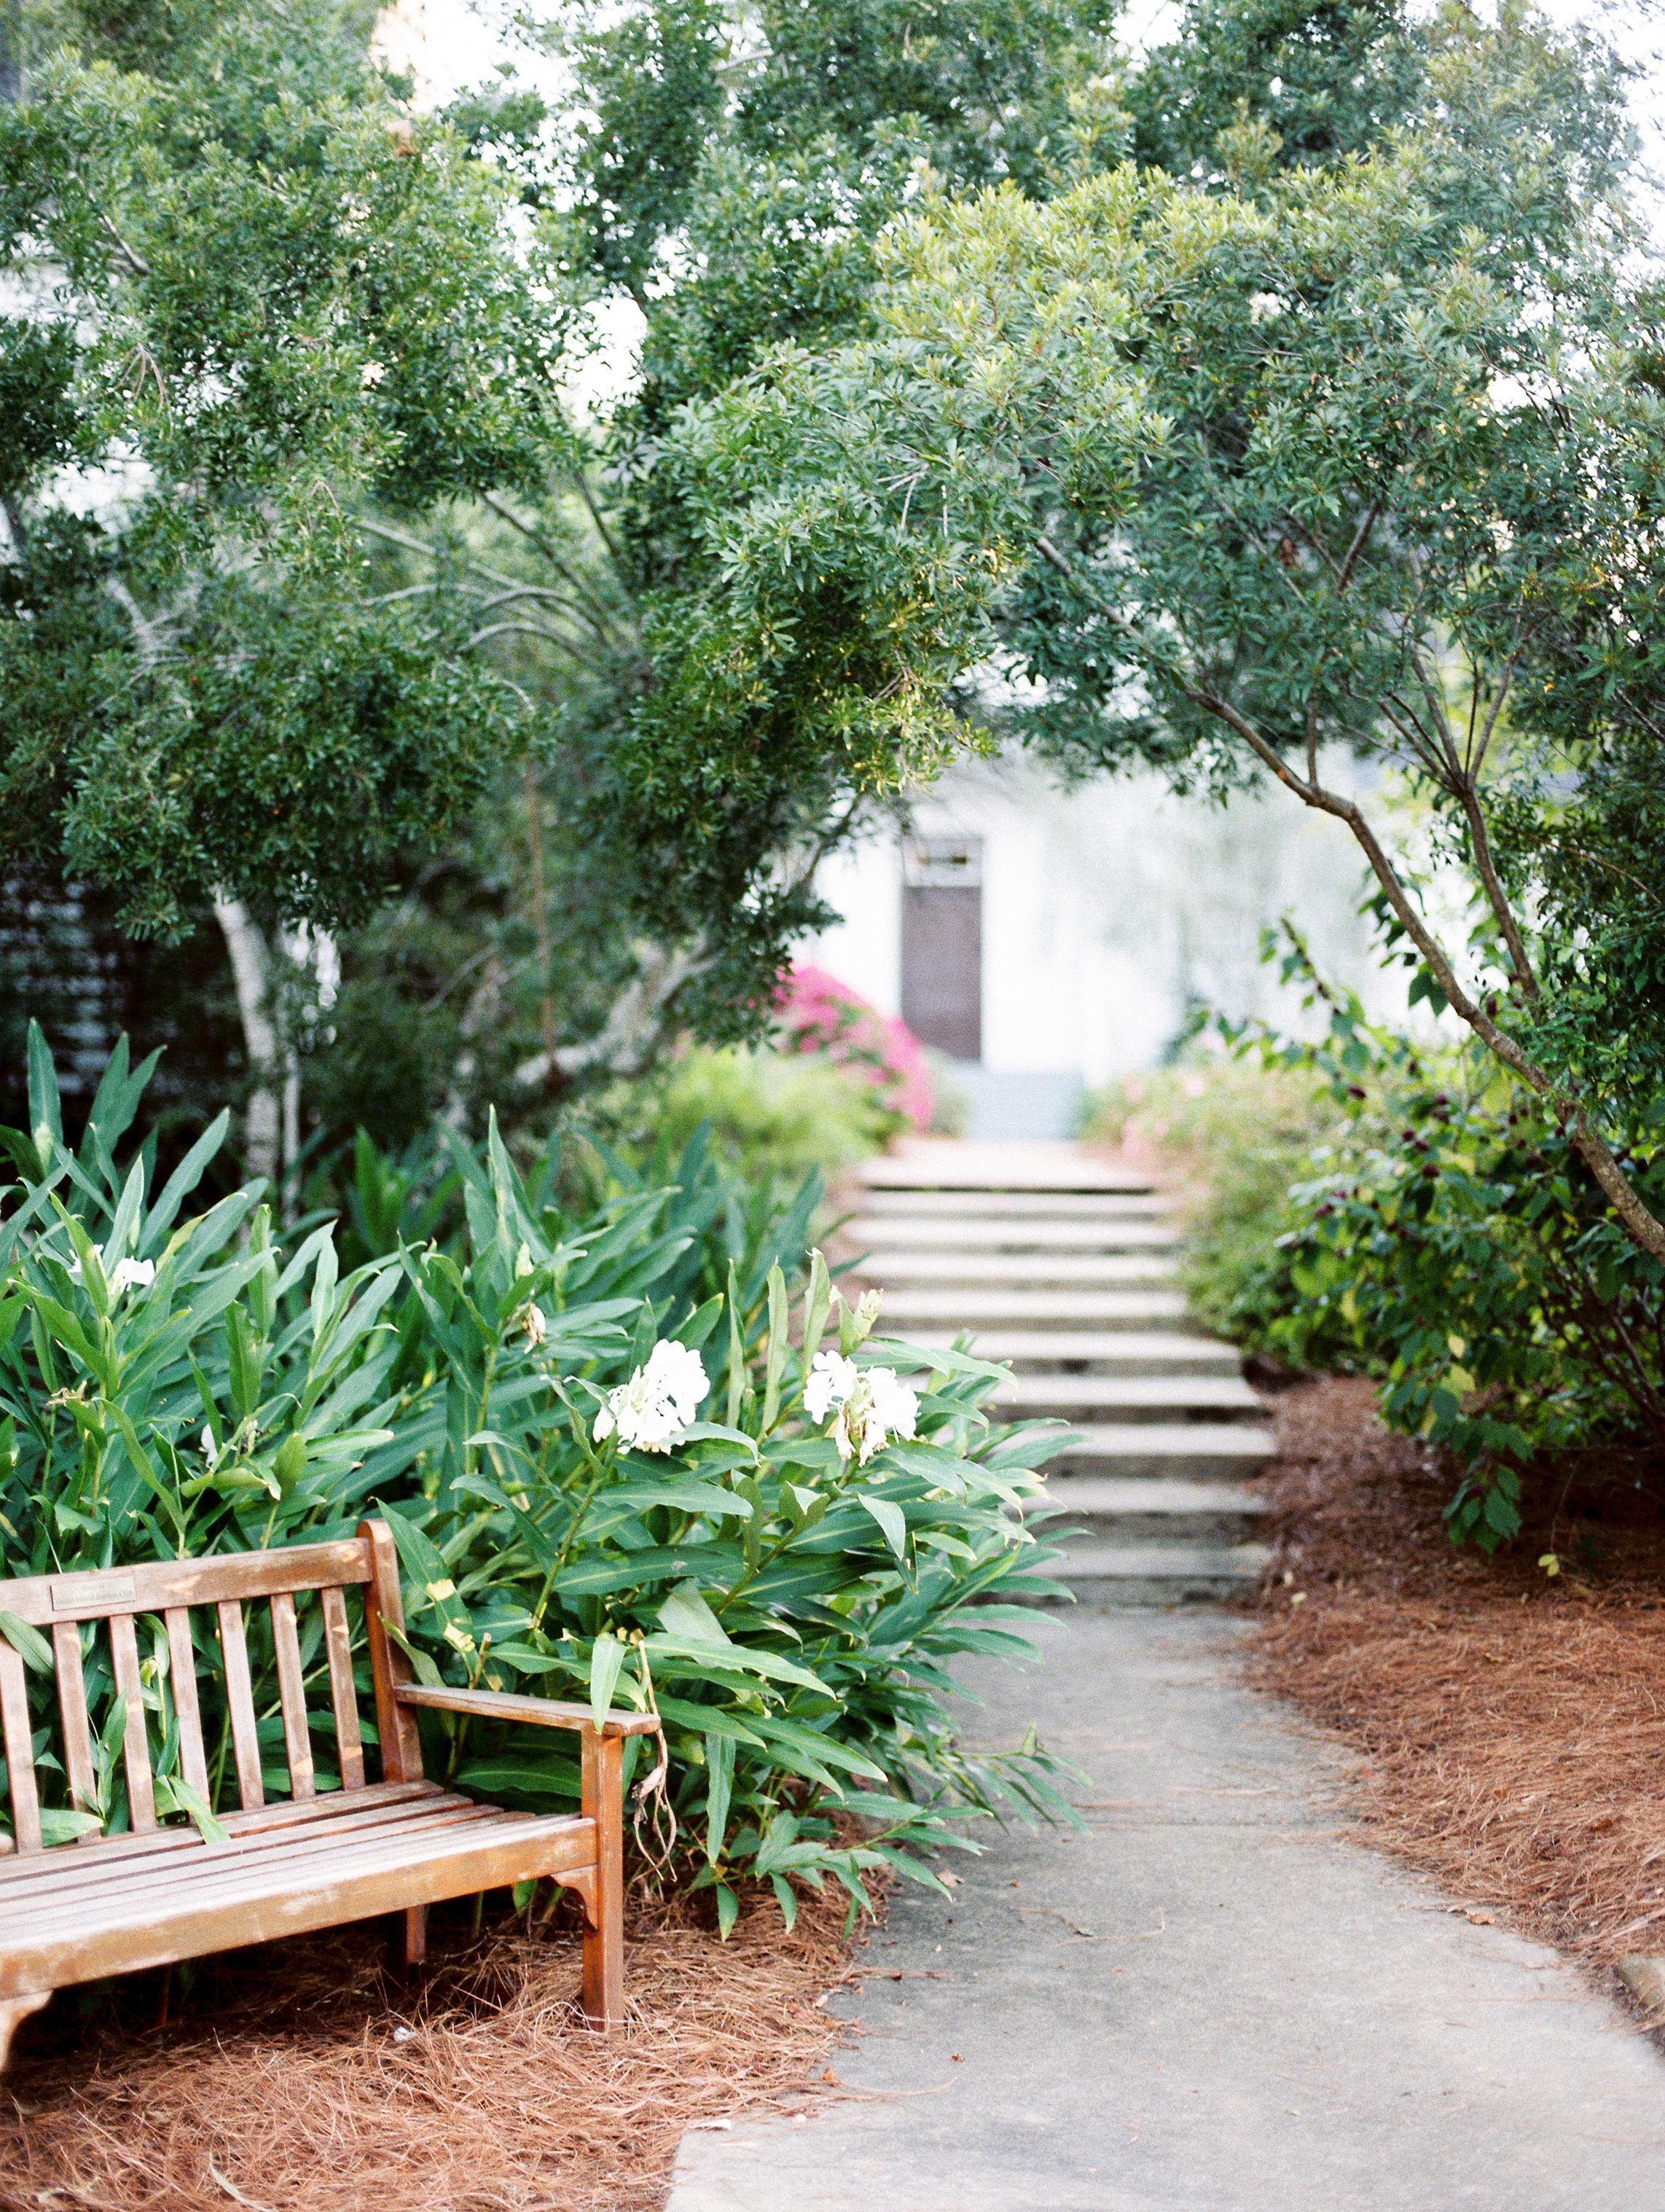 Weaver_Family_Botanical_Gardens_Columbus_Georgia_Fallen_Photography-100.JPG